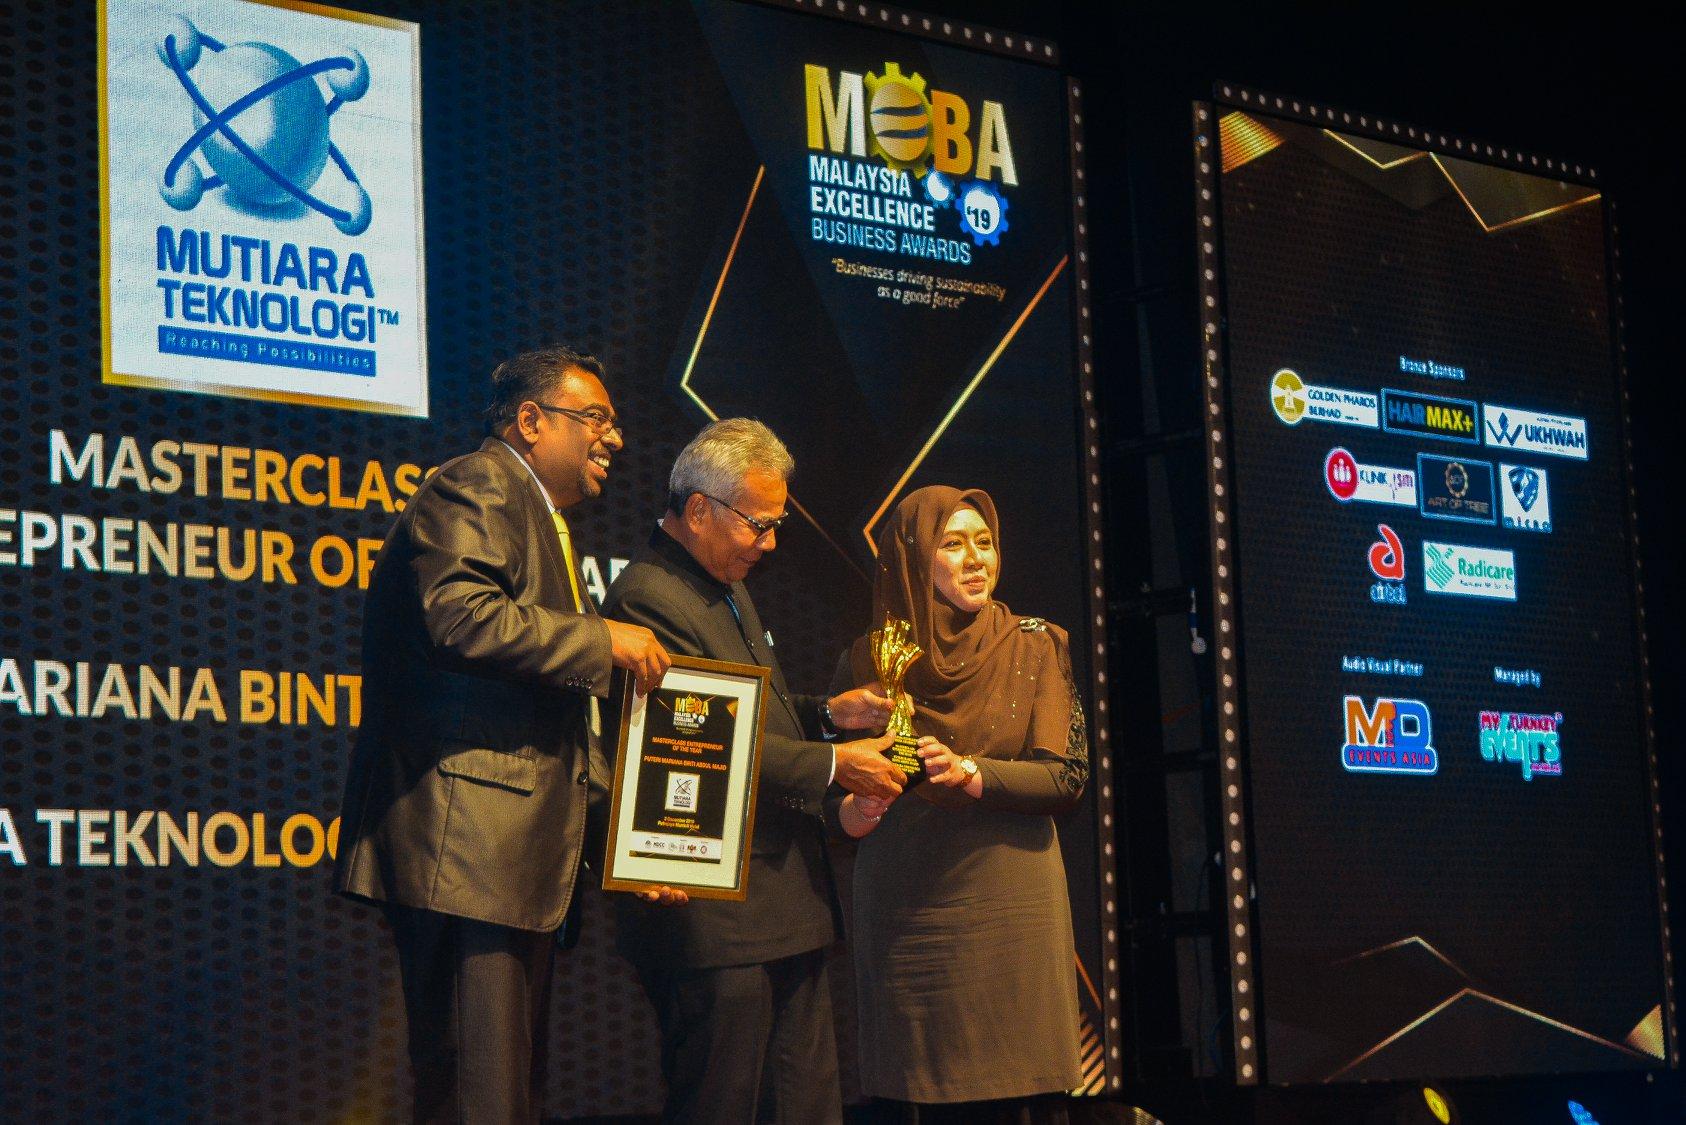 2019: MEBA Business Award 2019